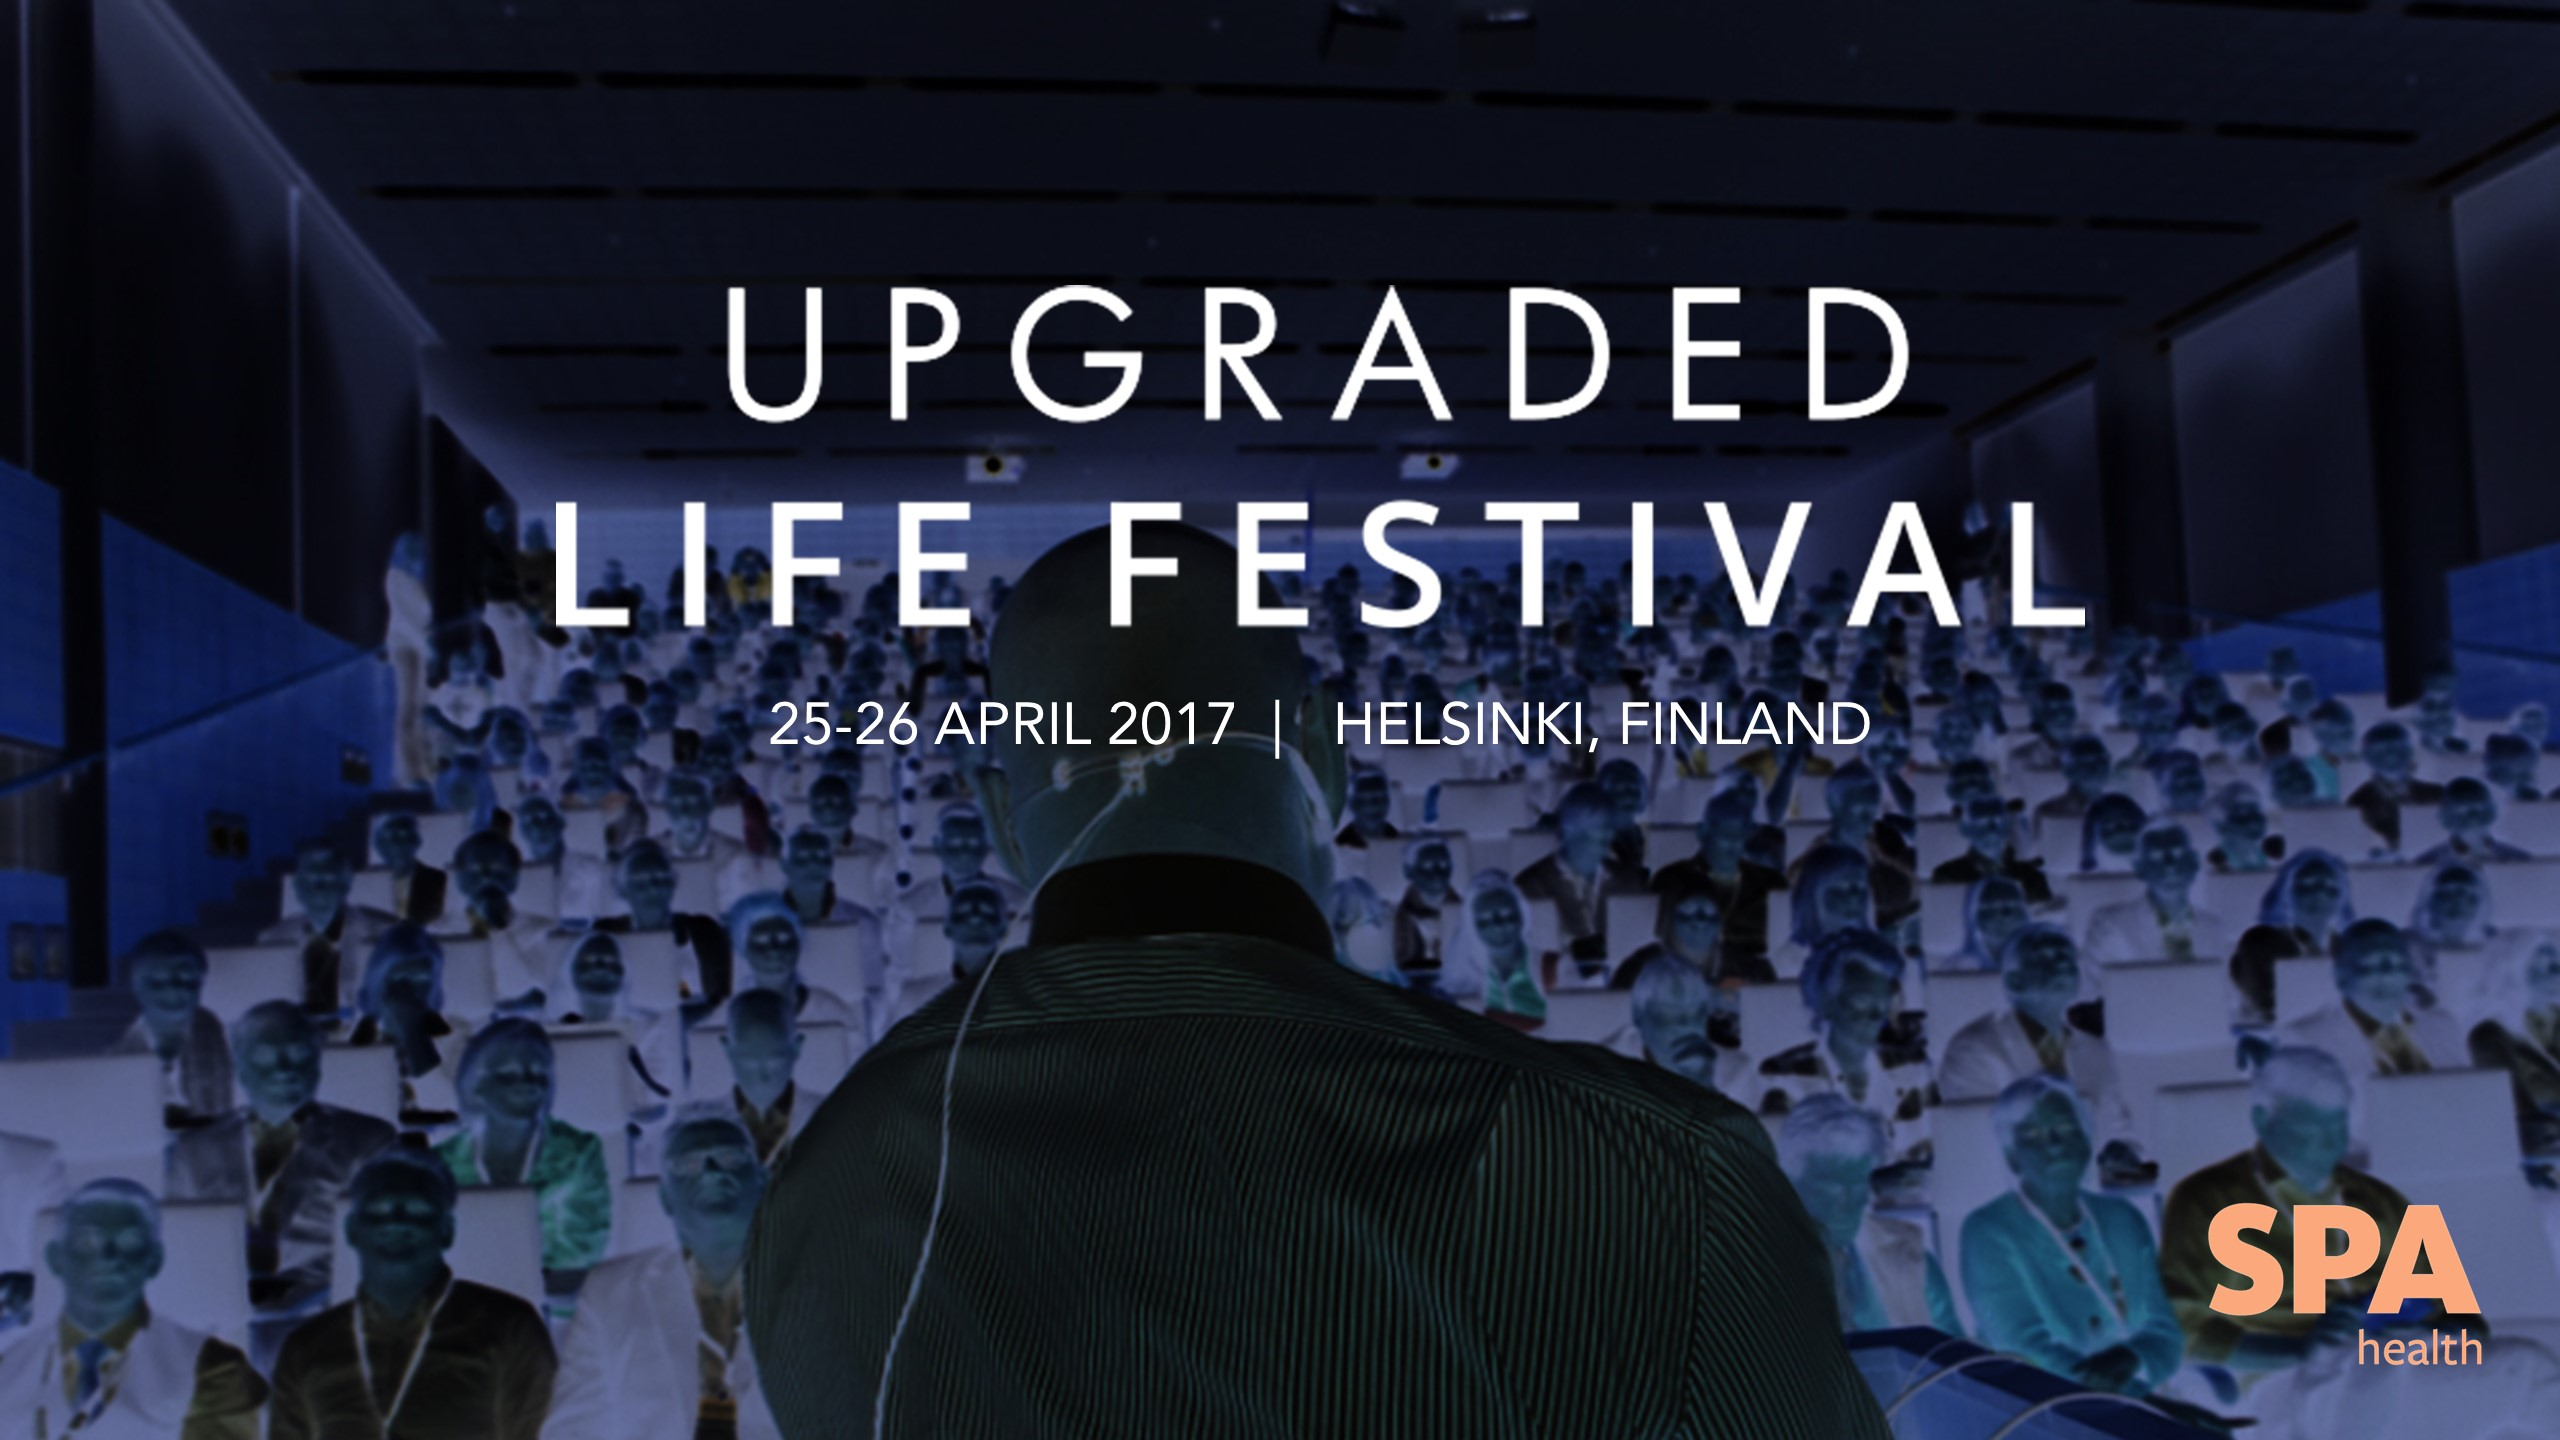 innokasmedical_fairs_events_upgraded_life_festival.jpg